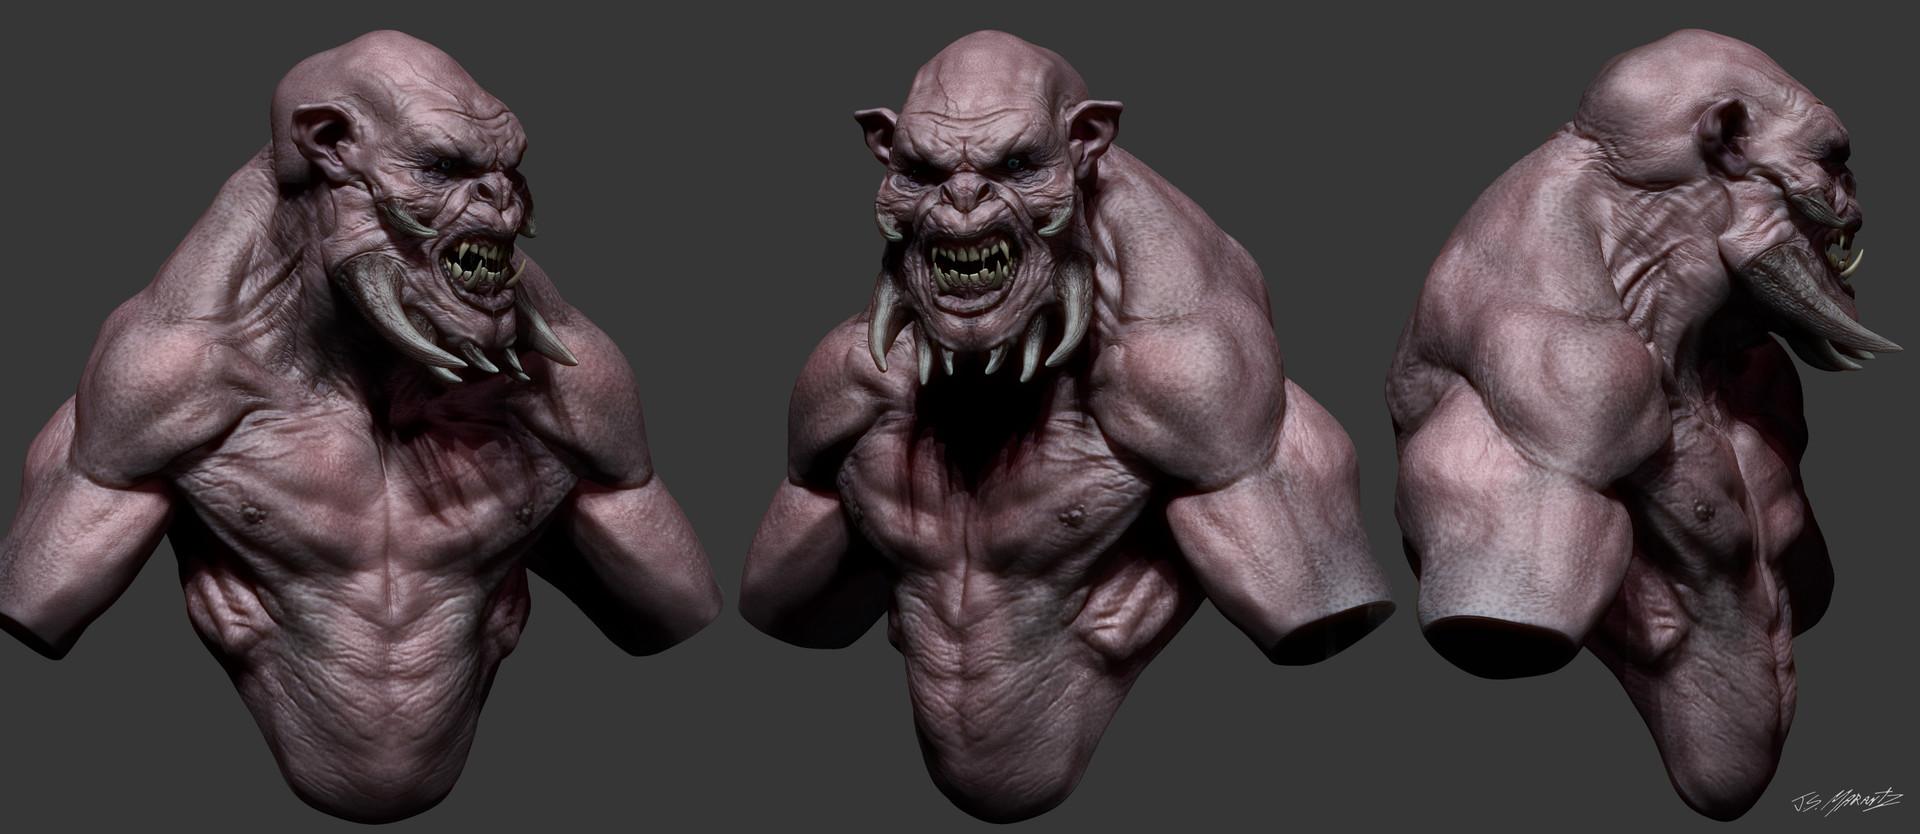 Jerad marantz demon ortho color hairless